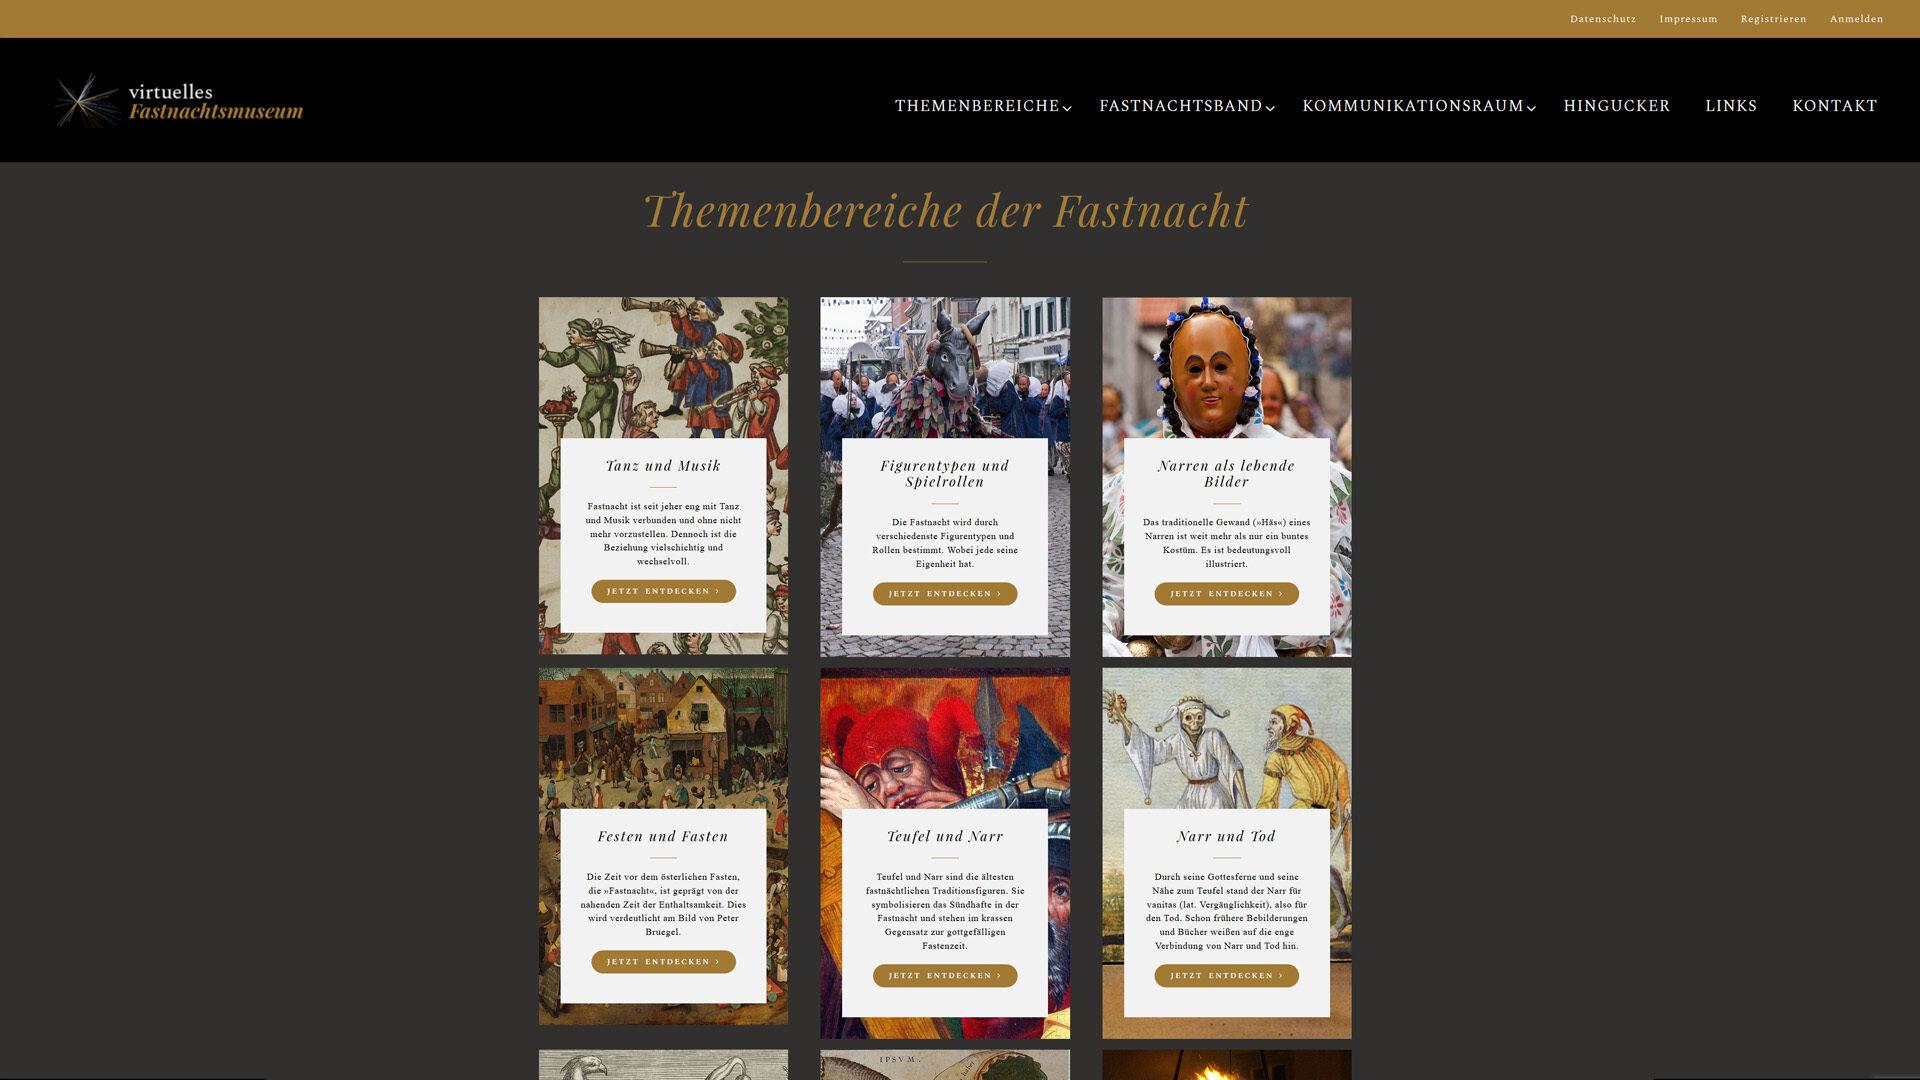 Virtuelles_Museum_Themenbereiche